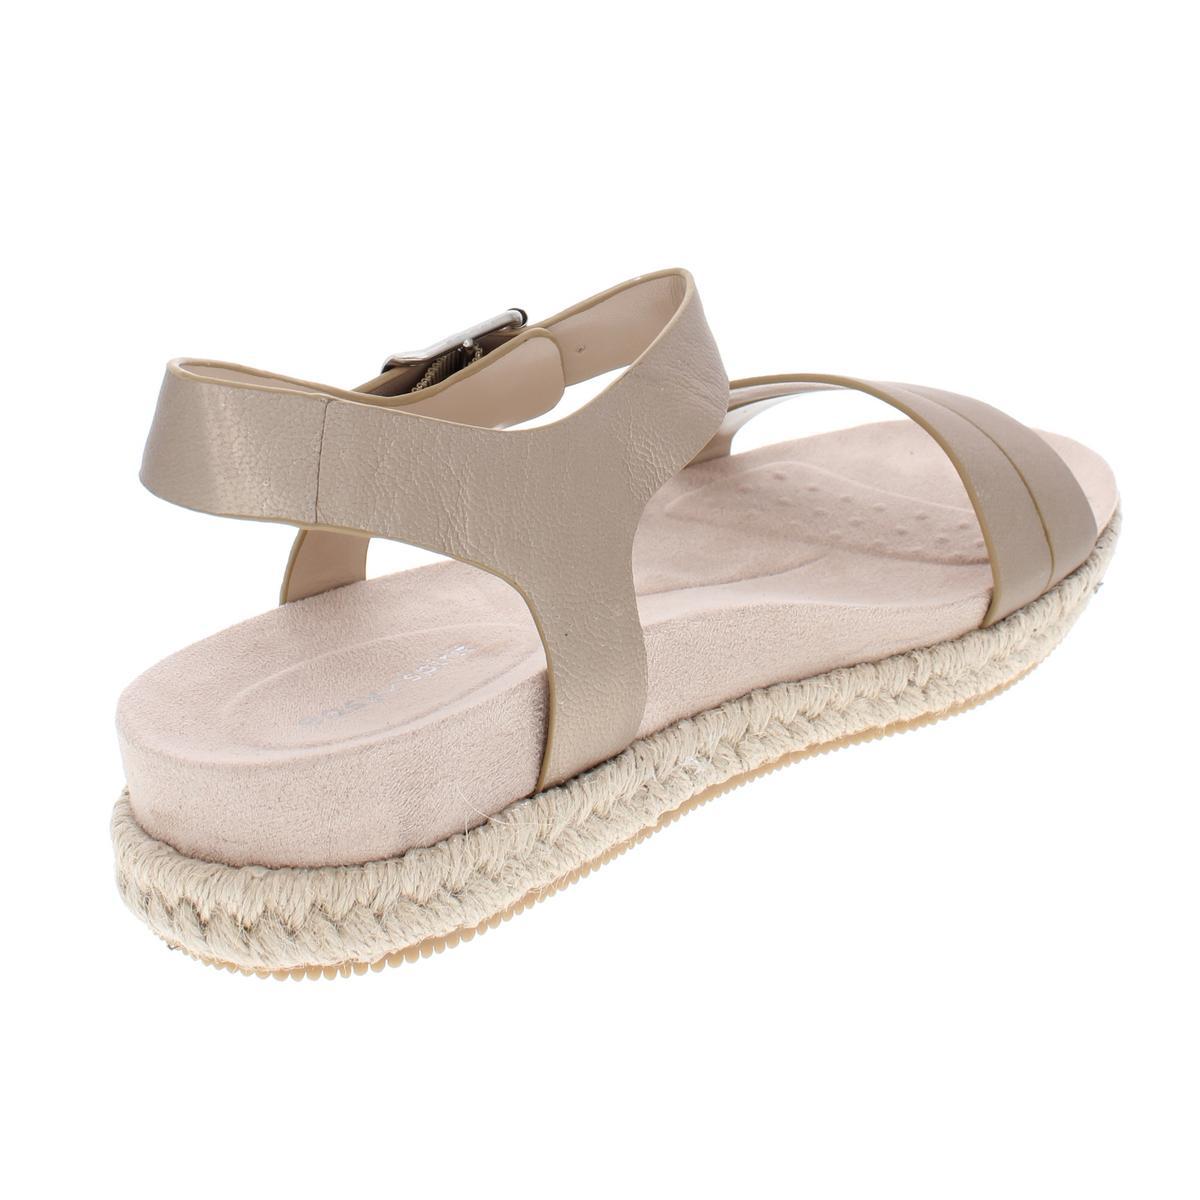 4c7be81780de Easy Spirit Womens Ixia Solid Leather Platform Espadrilles Sandals ...